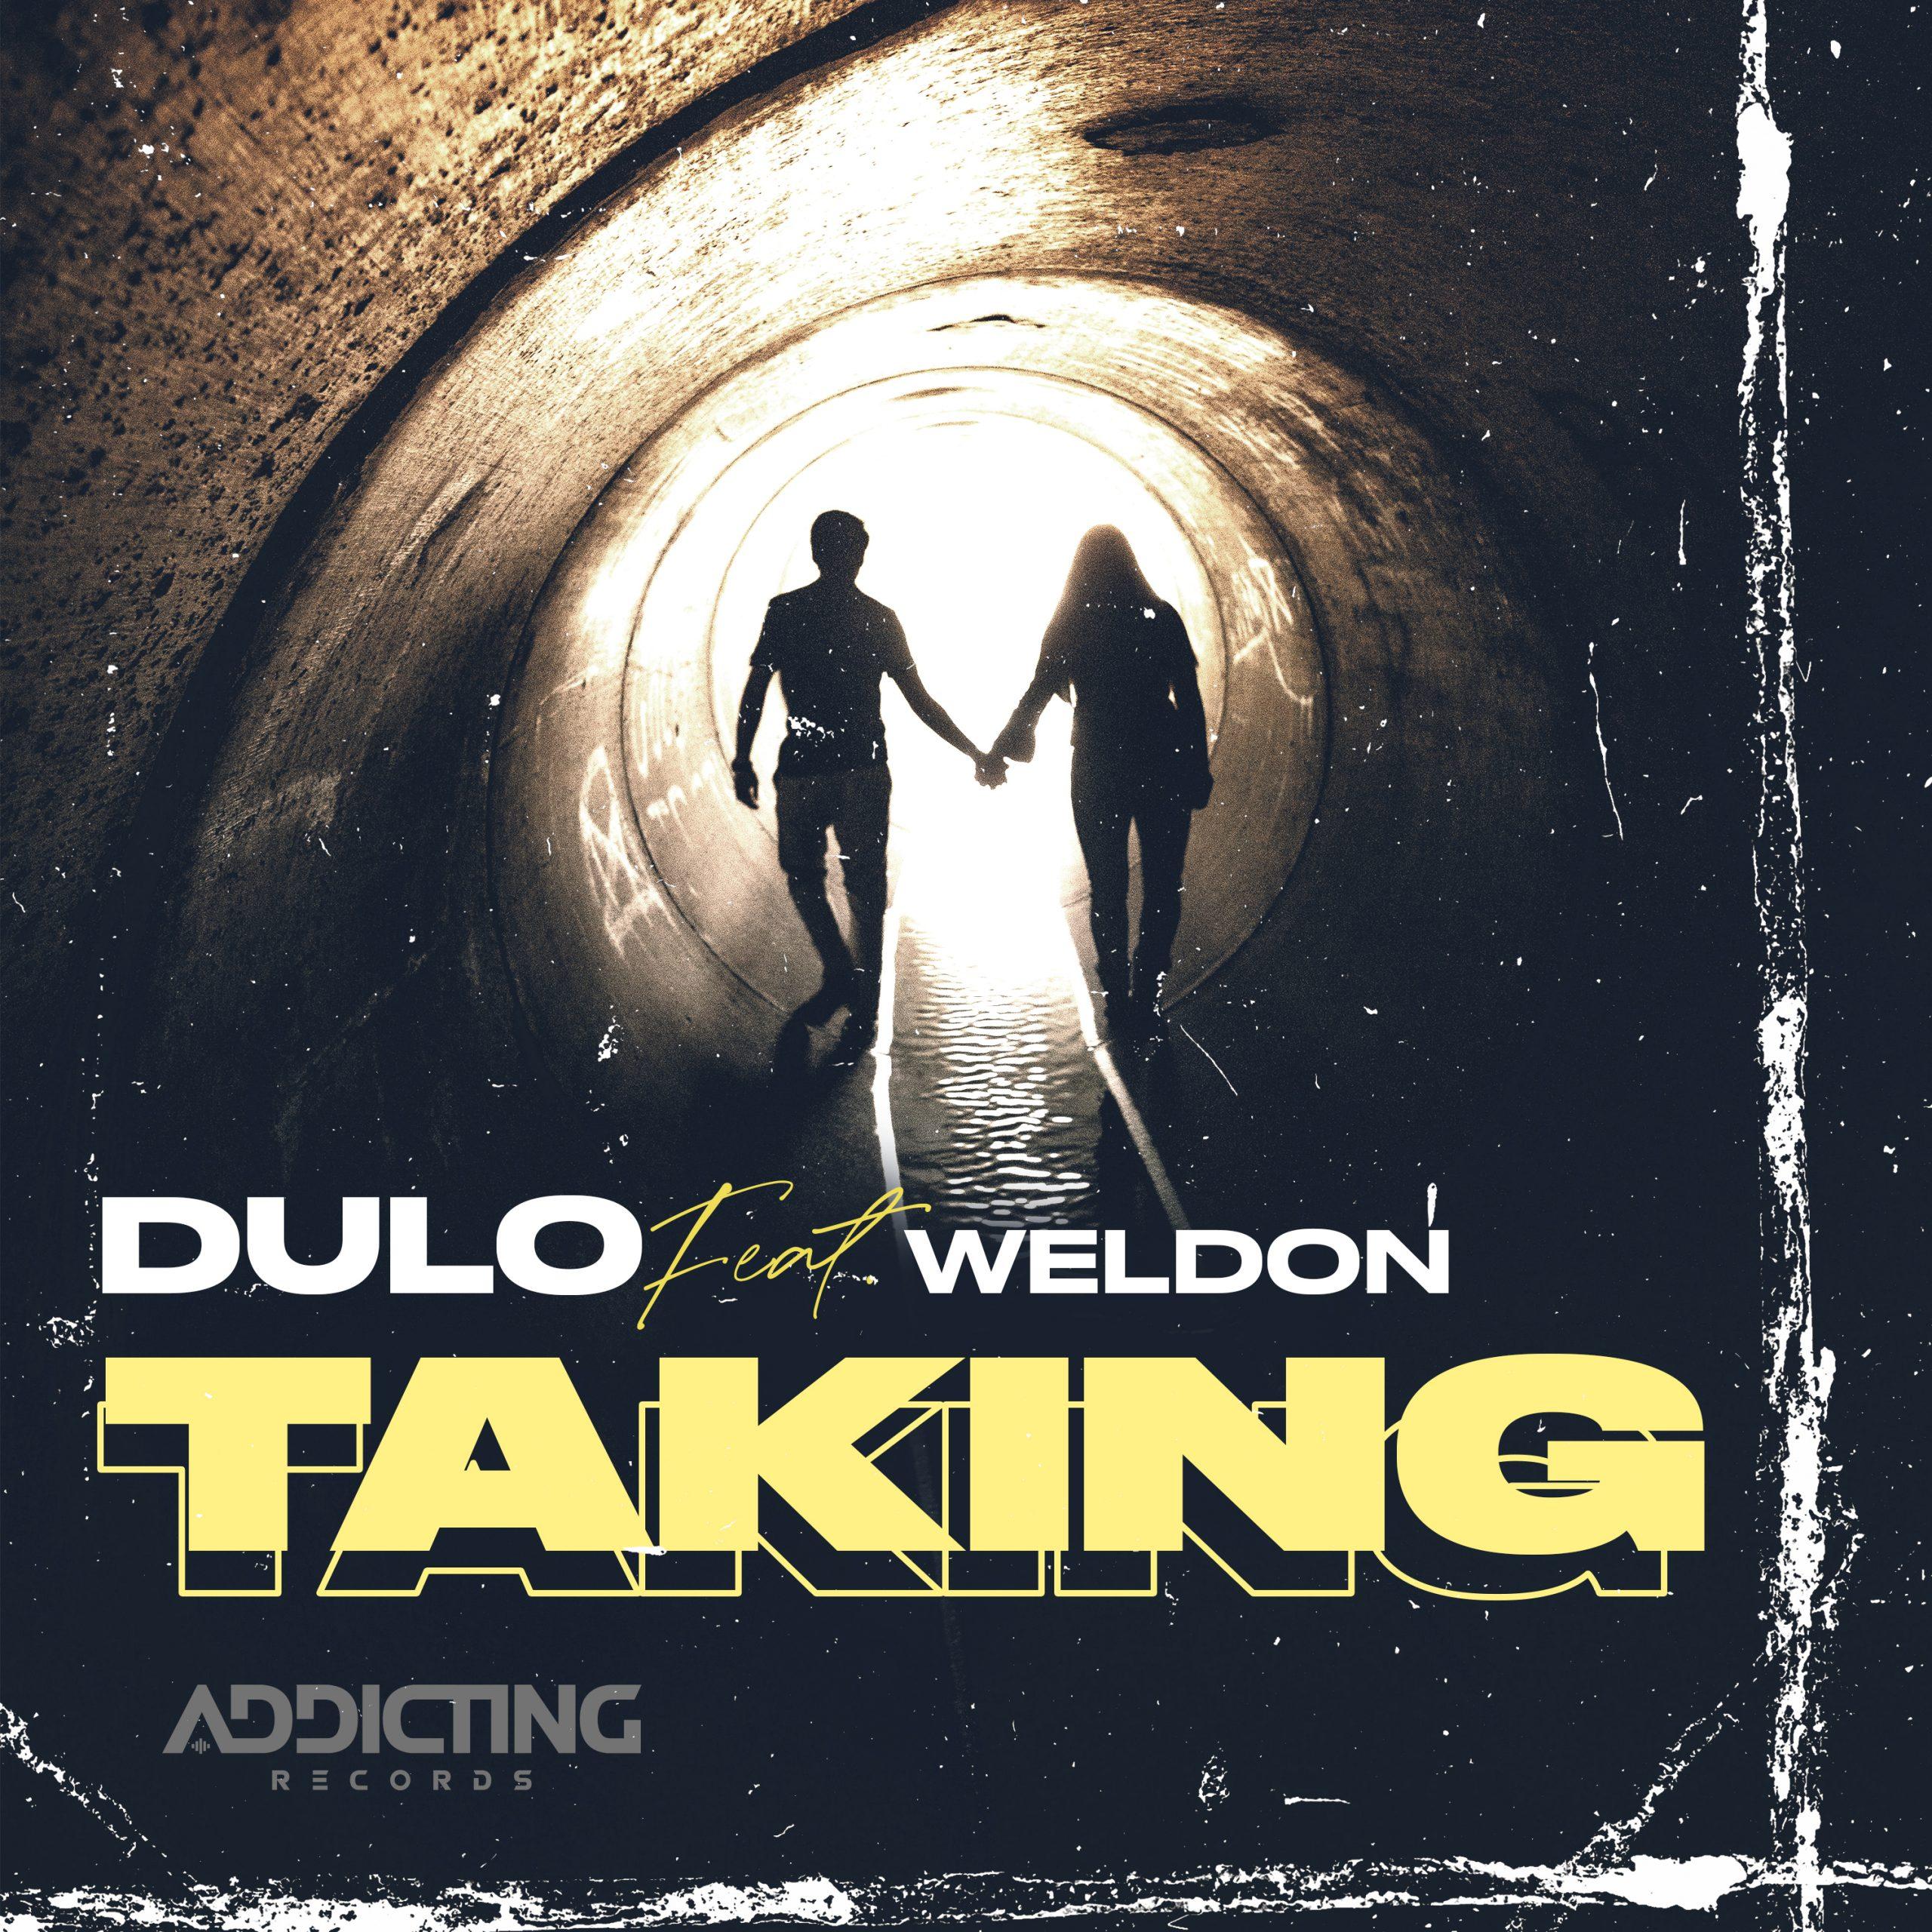 dulo_taking_addicting